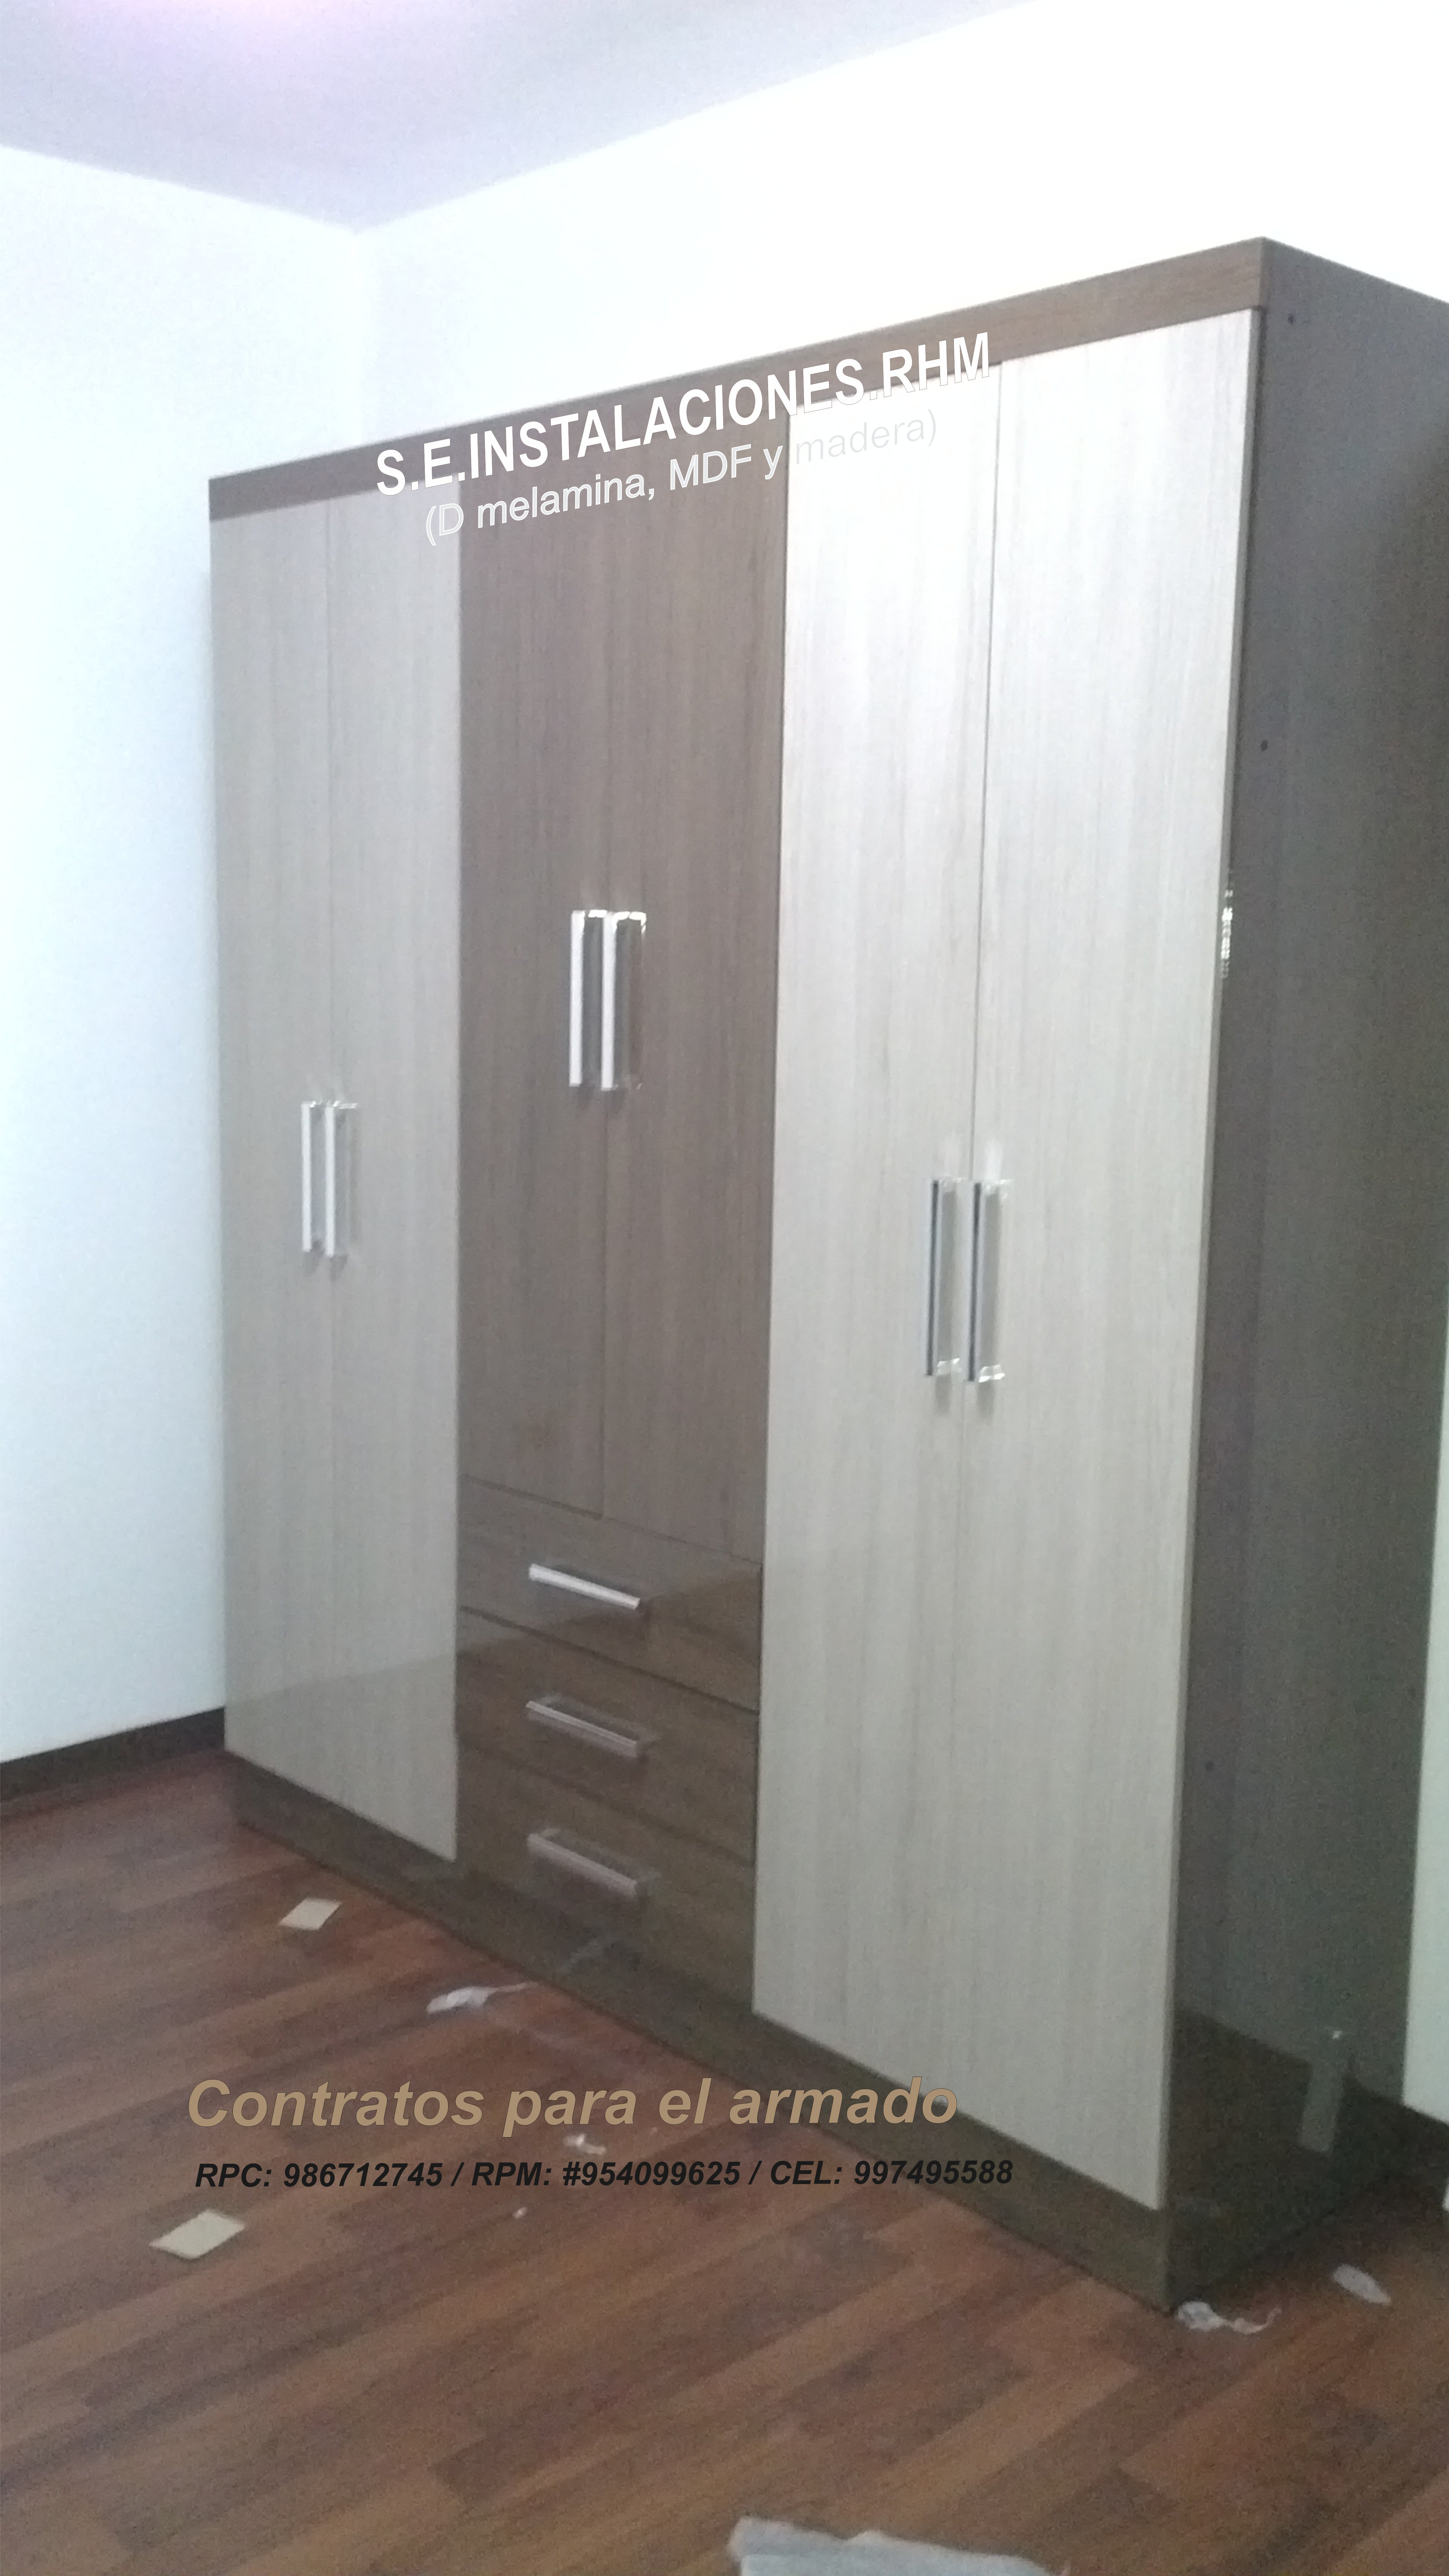 Armado de muebles de melamina de promart oechsle paris for Roperos de melamina para dormitorios